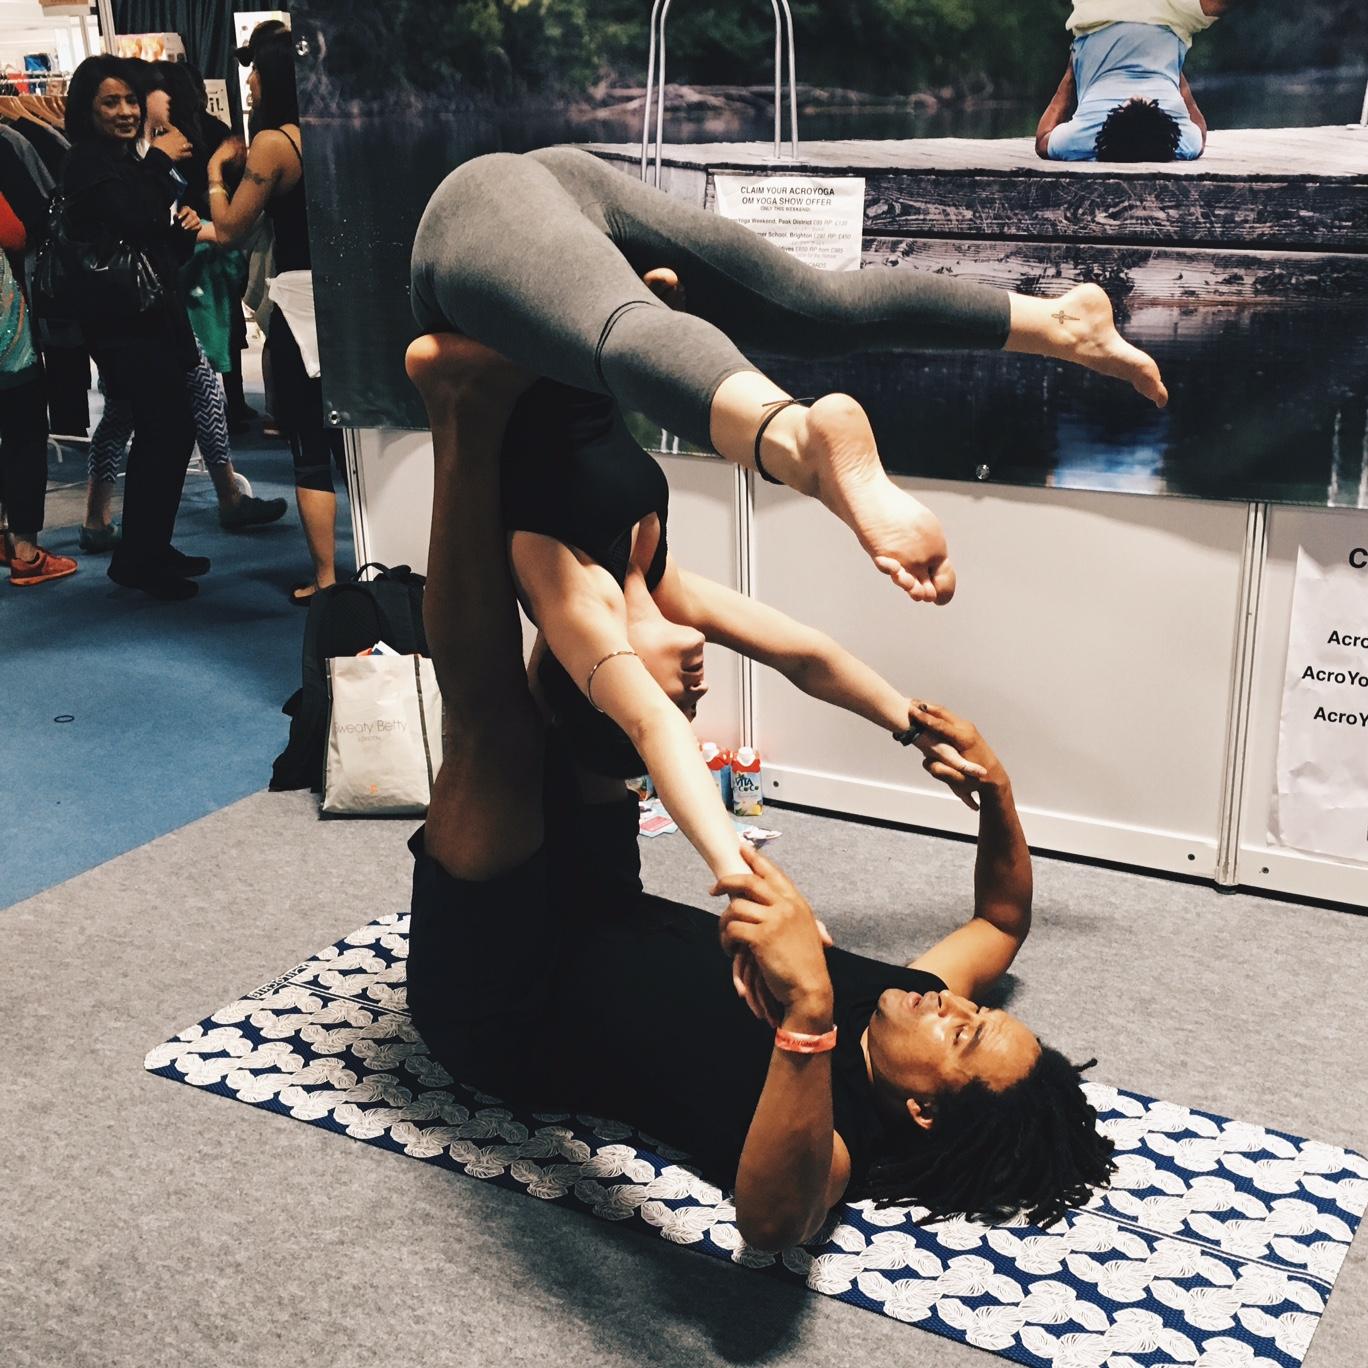 Acro Yoga Demo